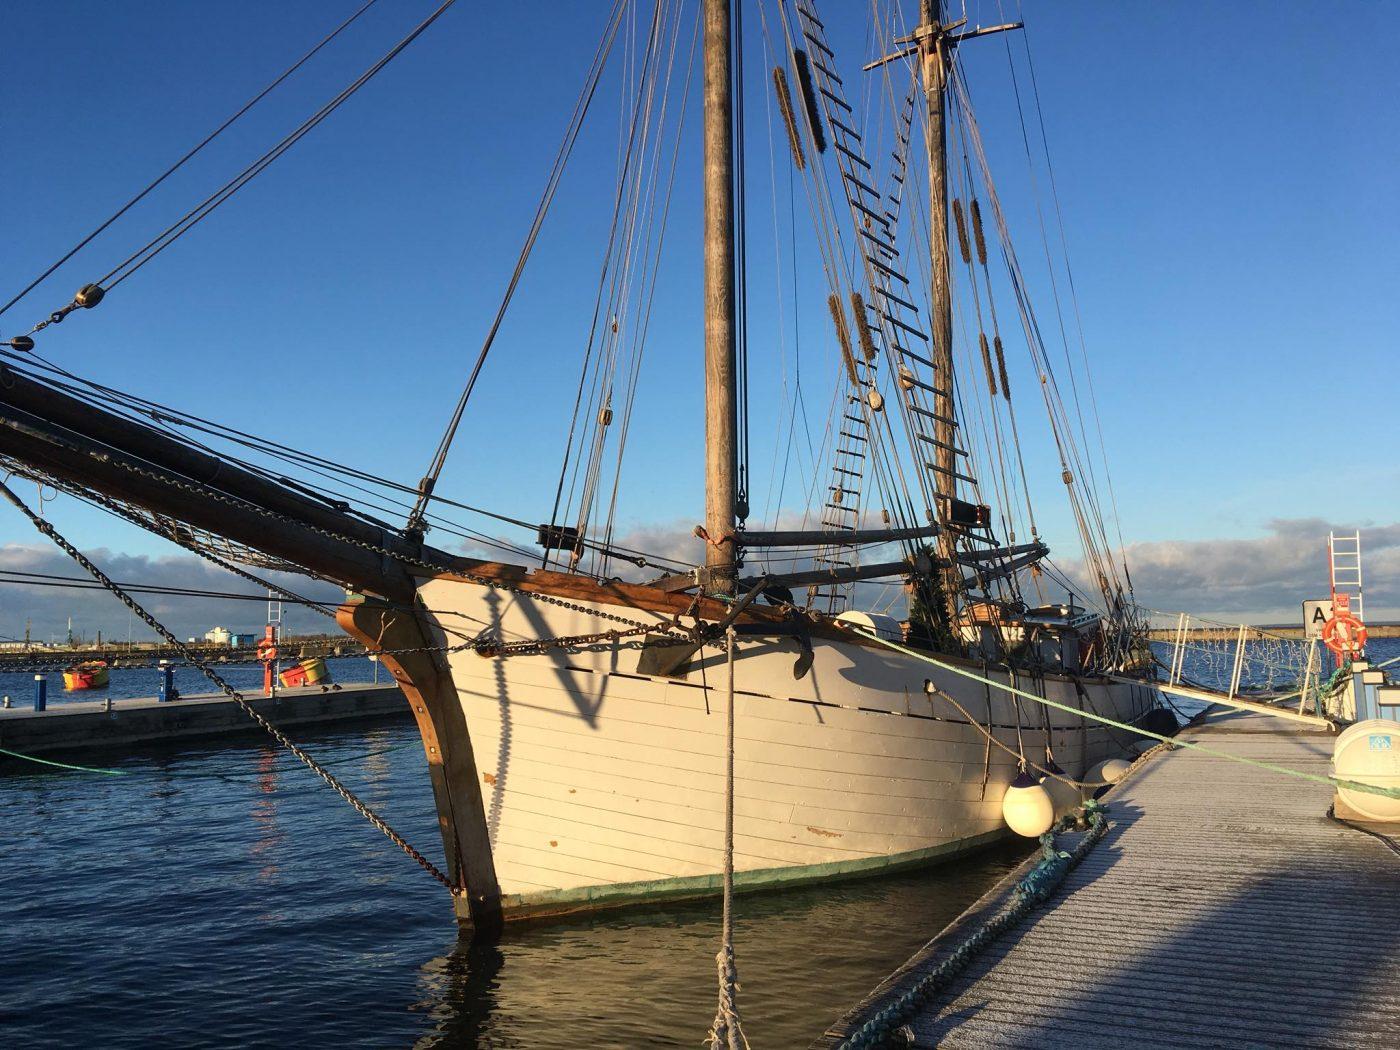 "INCENTIVE IDEA FOR GROUPS: Breakfast or dinner at Tallinn Bay at only genuine Estonian gaff schooner ""Hoppet"""